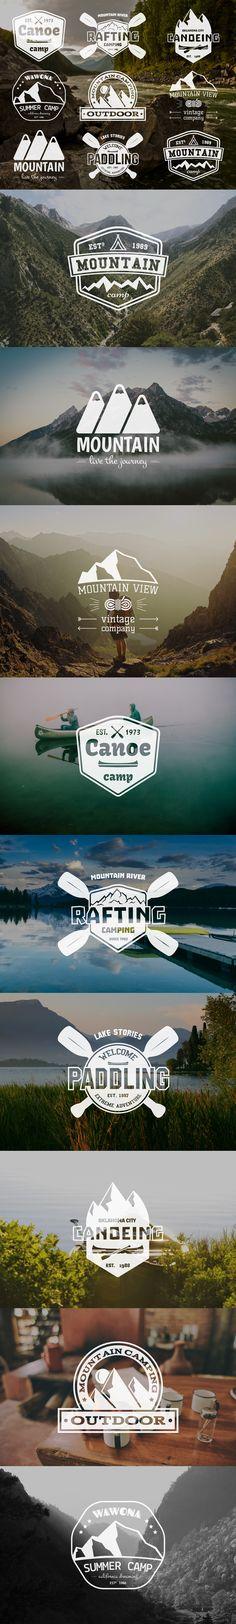 Set of Mountain and Kayaking Monochrome Logo Design. on Behance